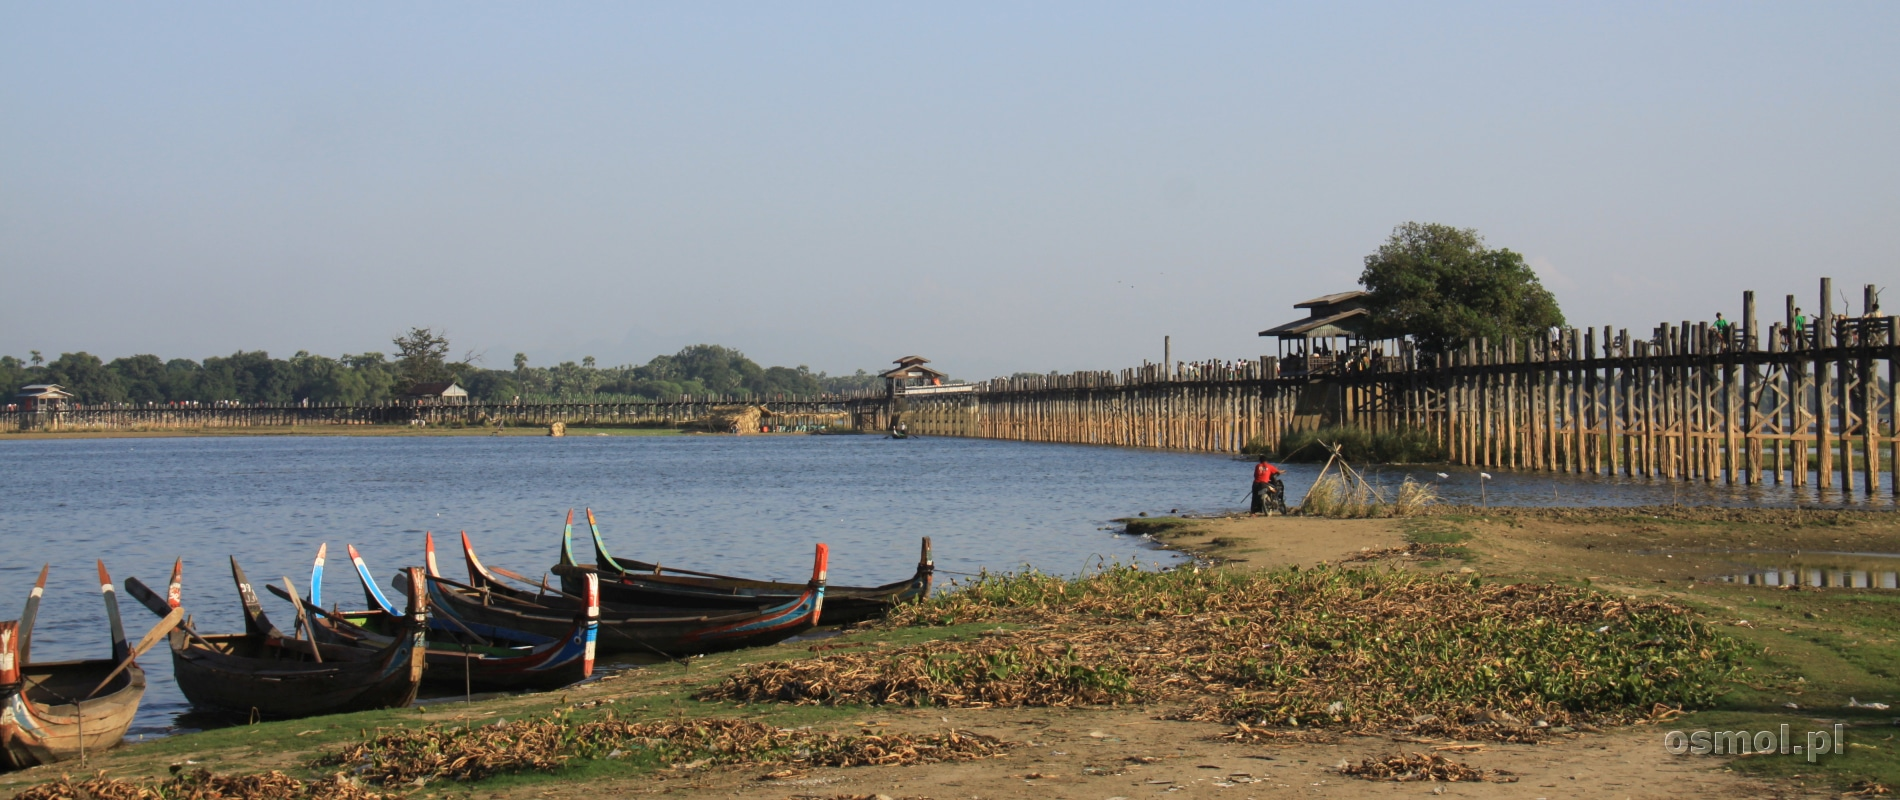 Most U Bein Birma